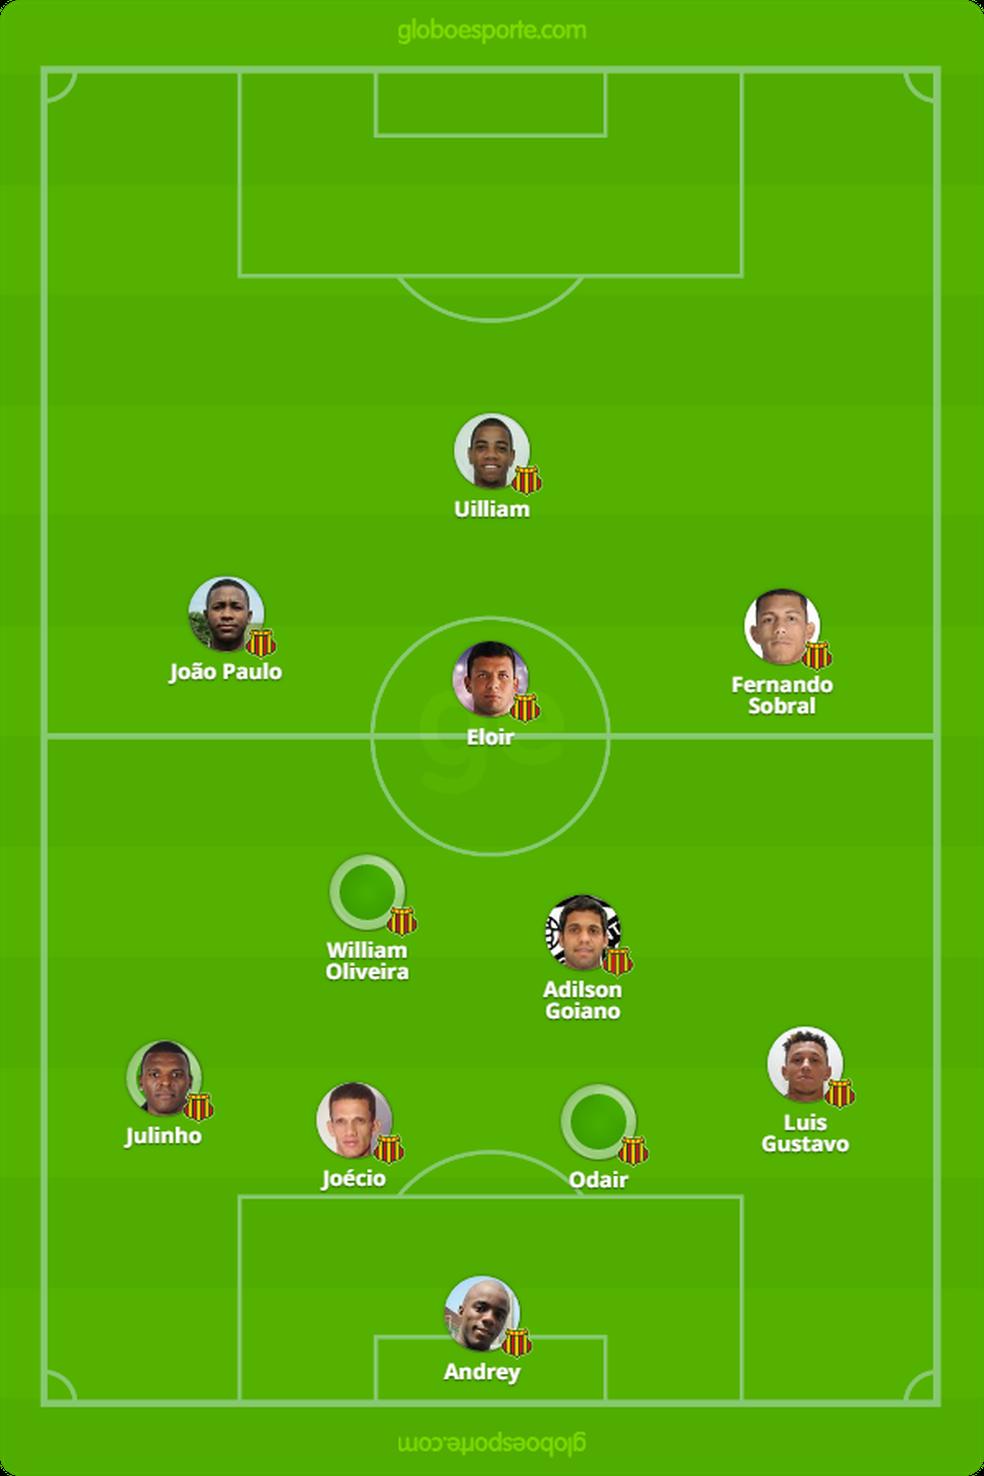 Rodada 30 Tudo O Que Voce Precisa Saber Sobre Sampaio Correa X Figueirense Brasileirao Serie B Ge